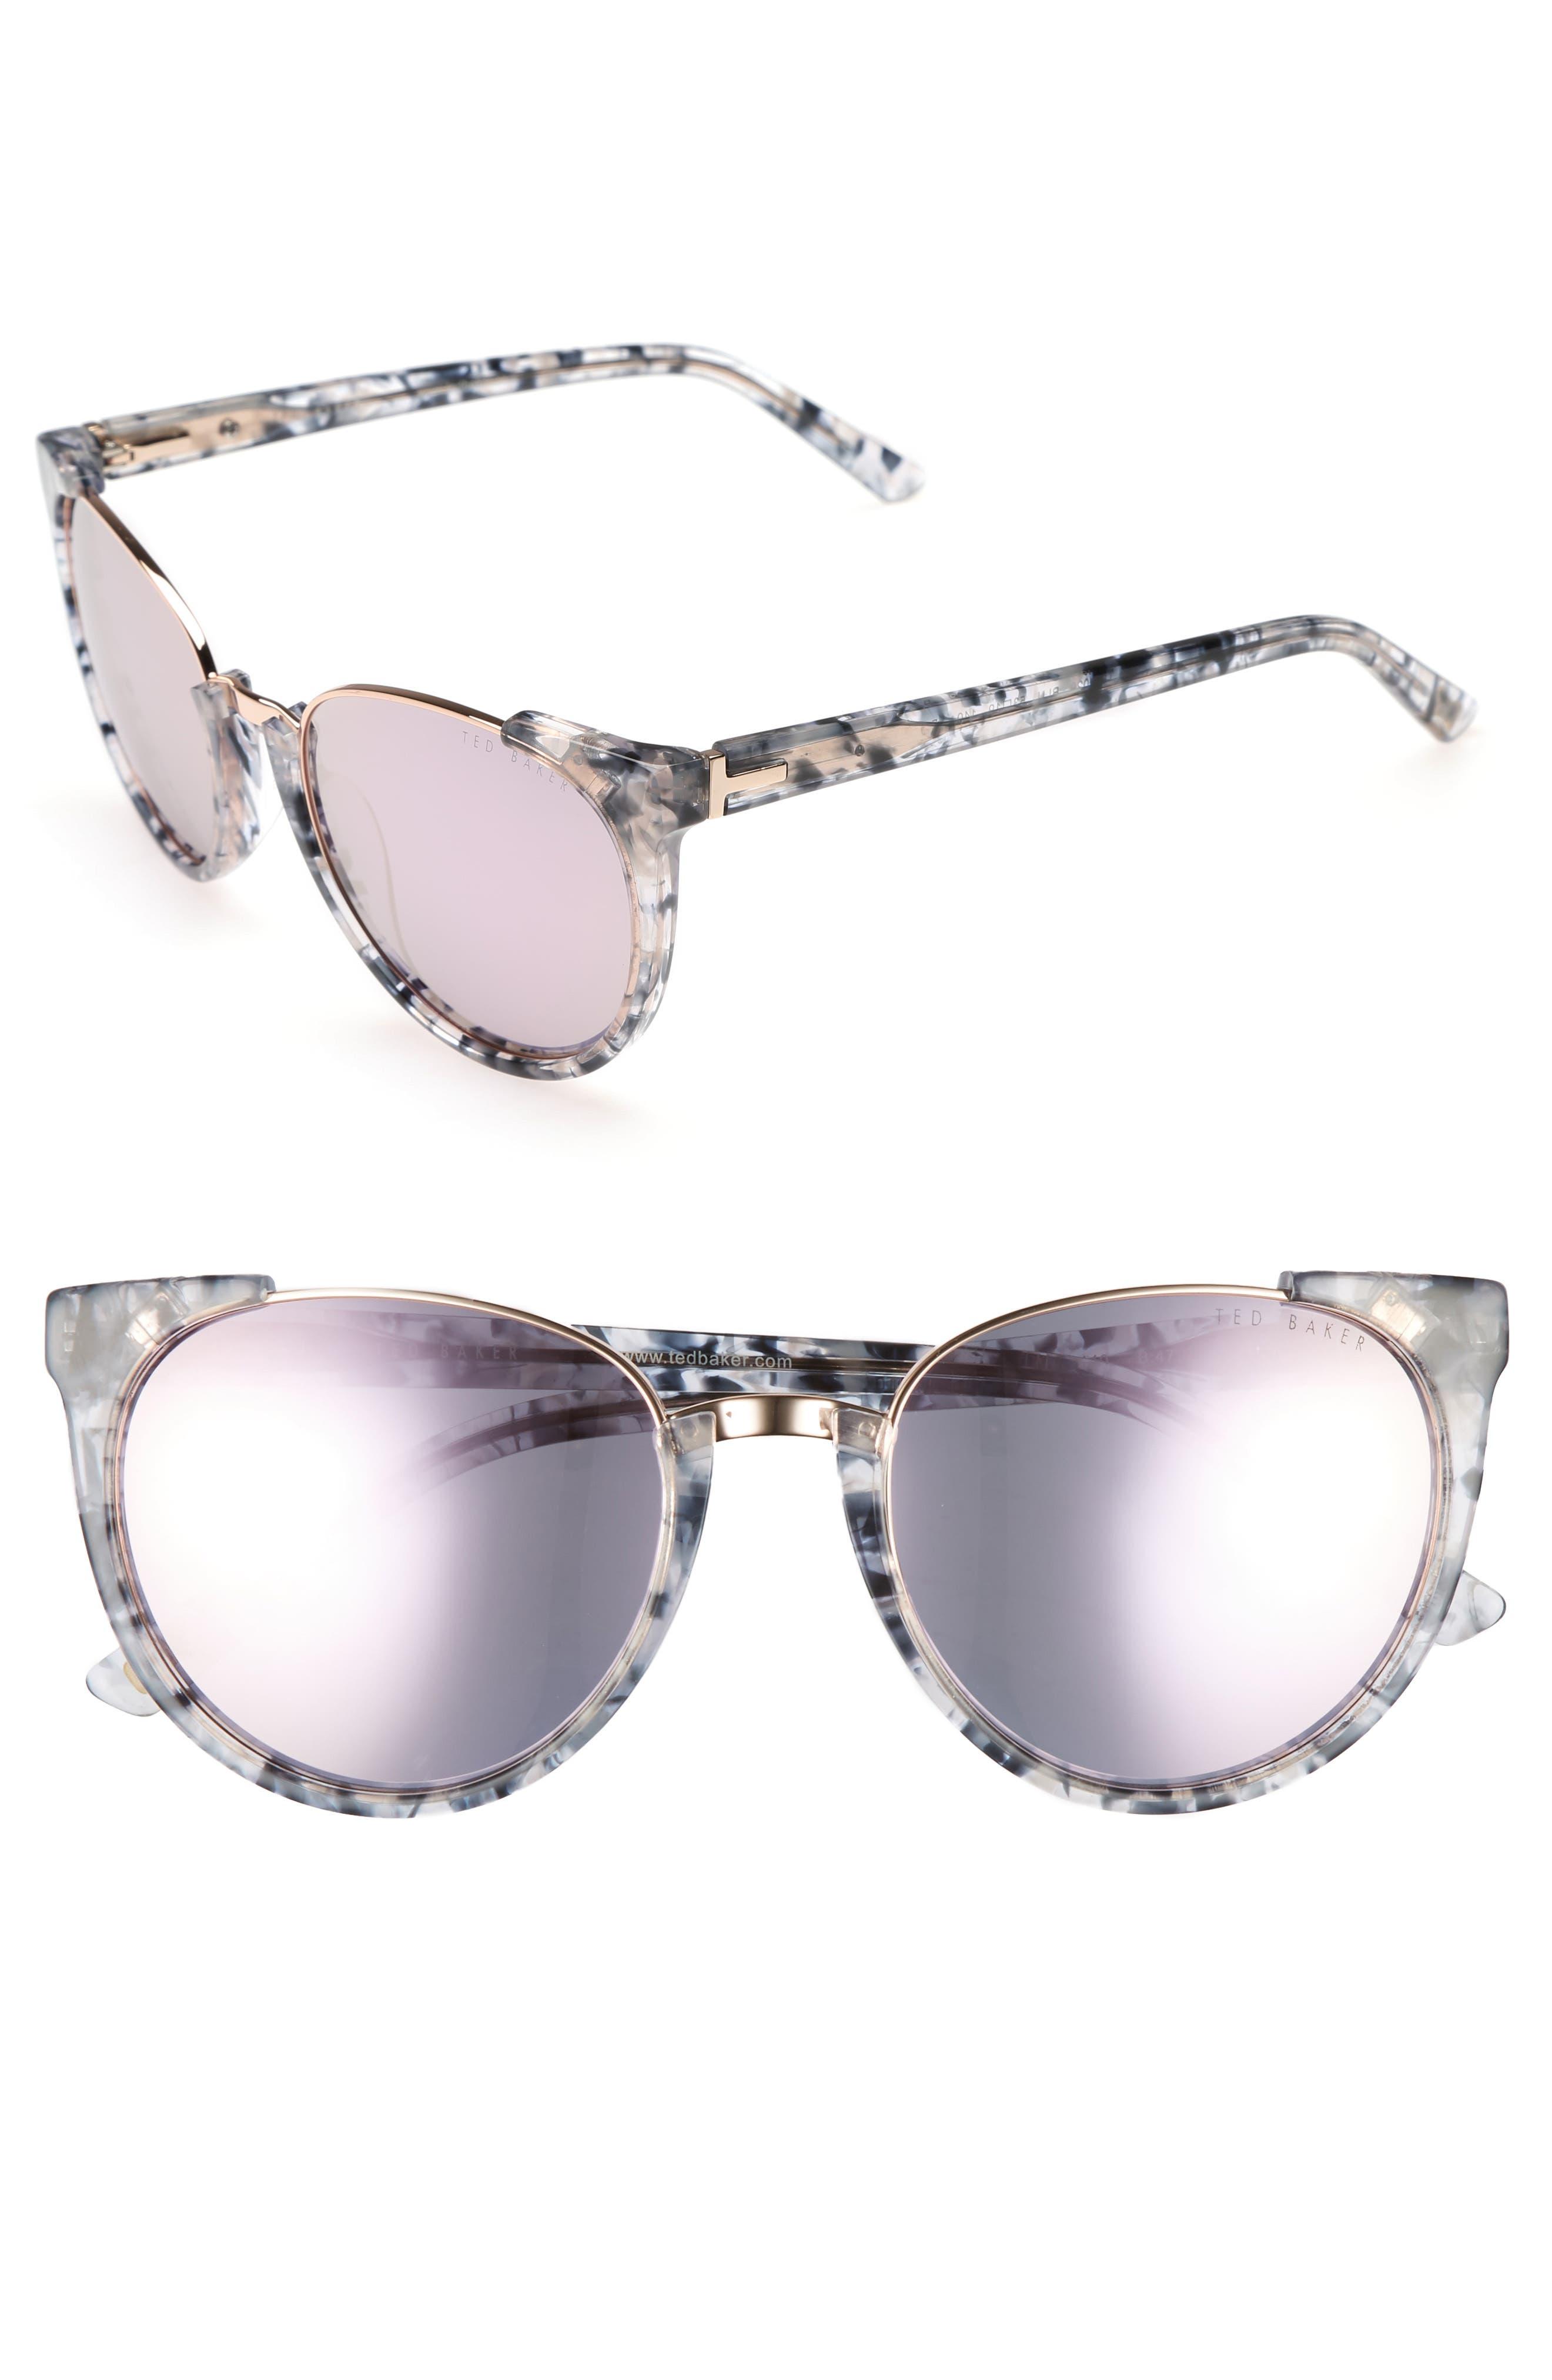 53mm Modified Oval Sunglasses,                             Main thumbnail 1, color,                             Blue